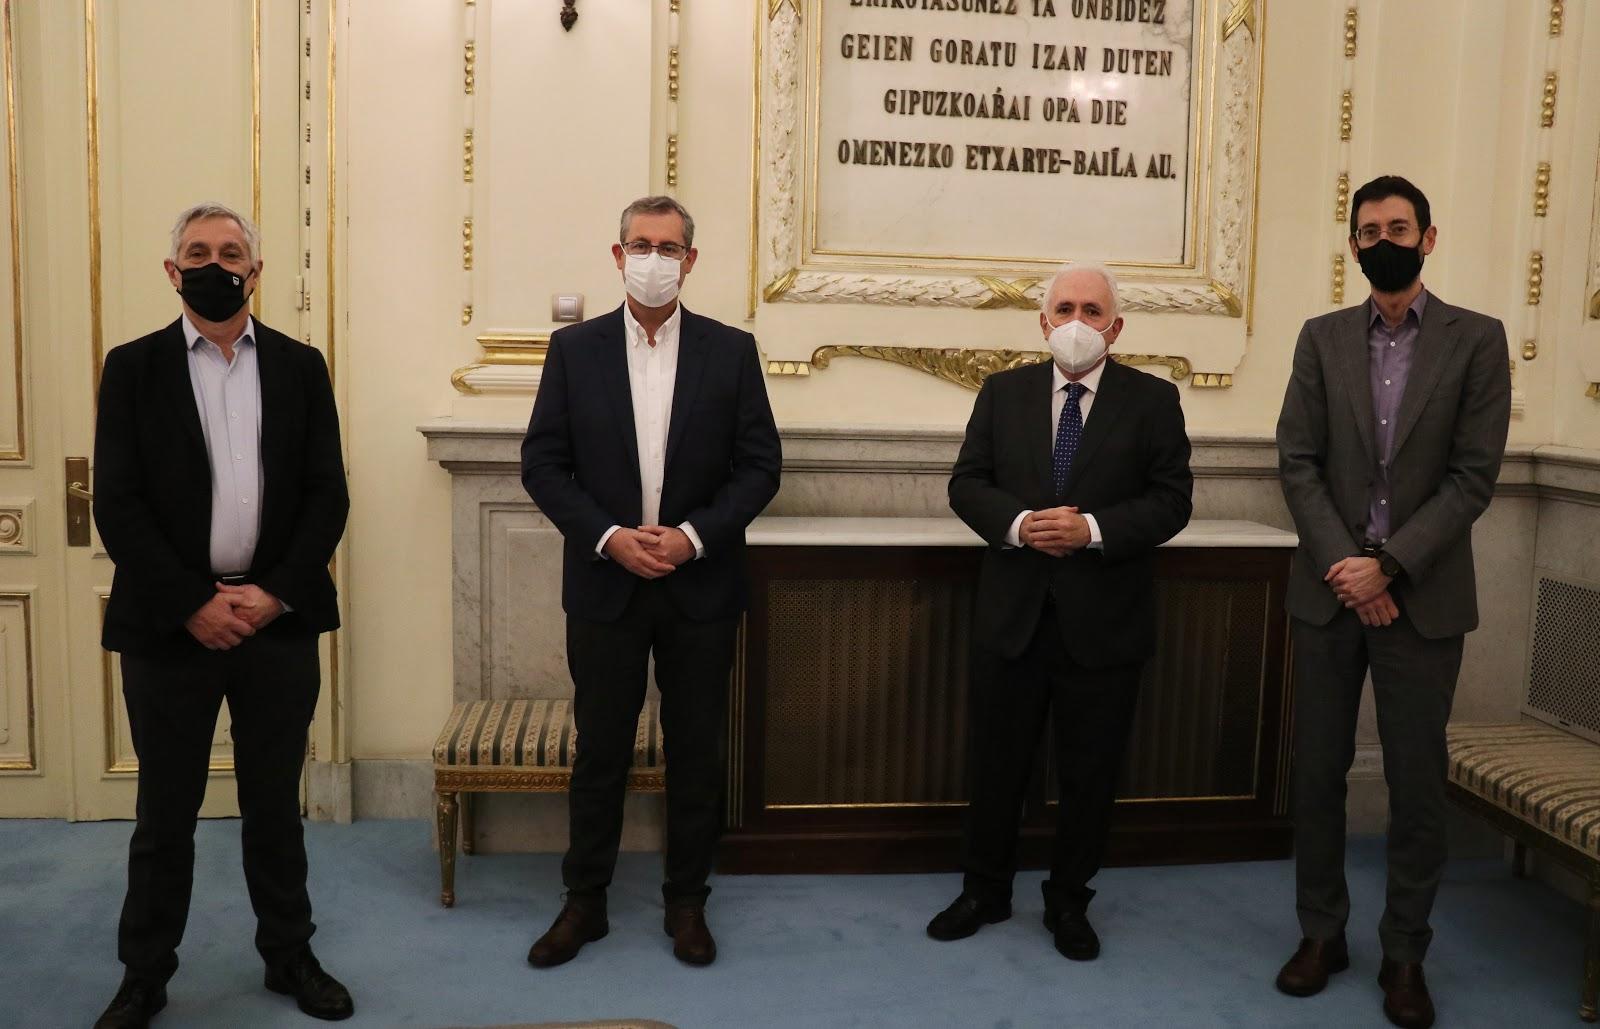 De izquierda a derecha: Sebas Zurutuza, Markel Olano, José Mª Guibert y Xabier Riezu. Foto Deusto